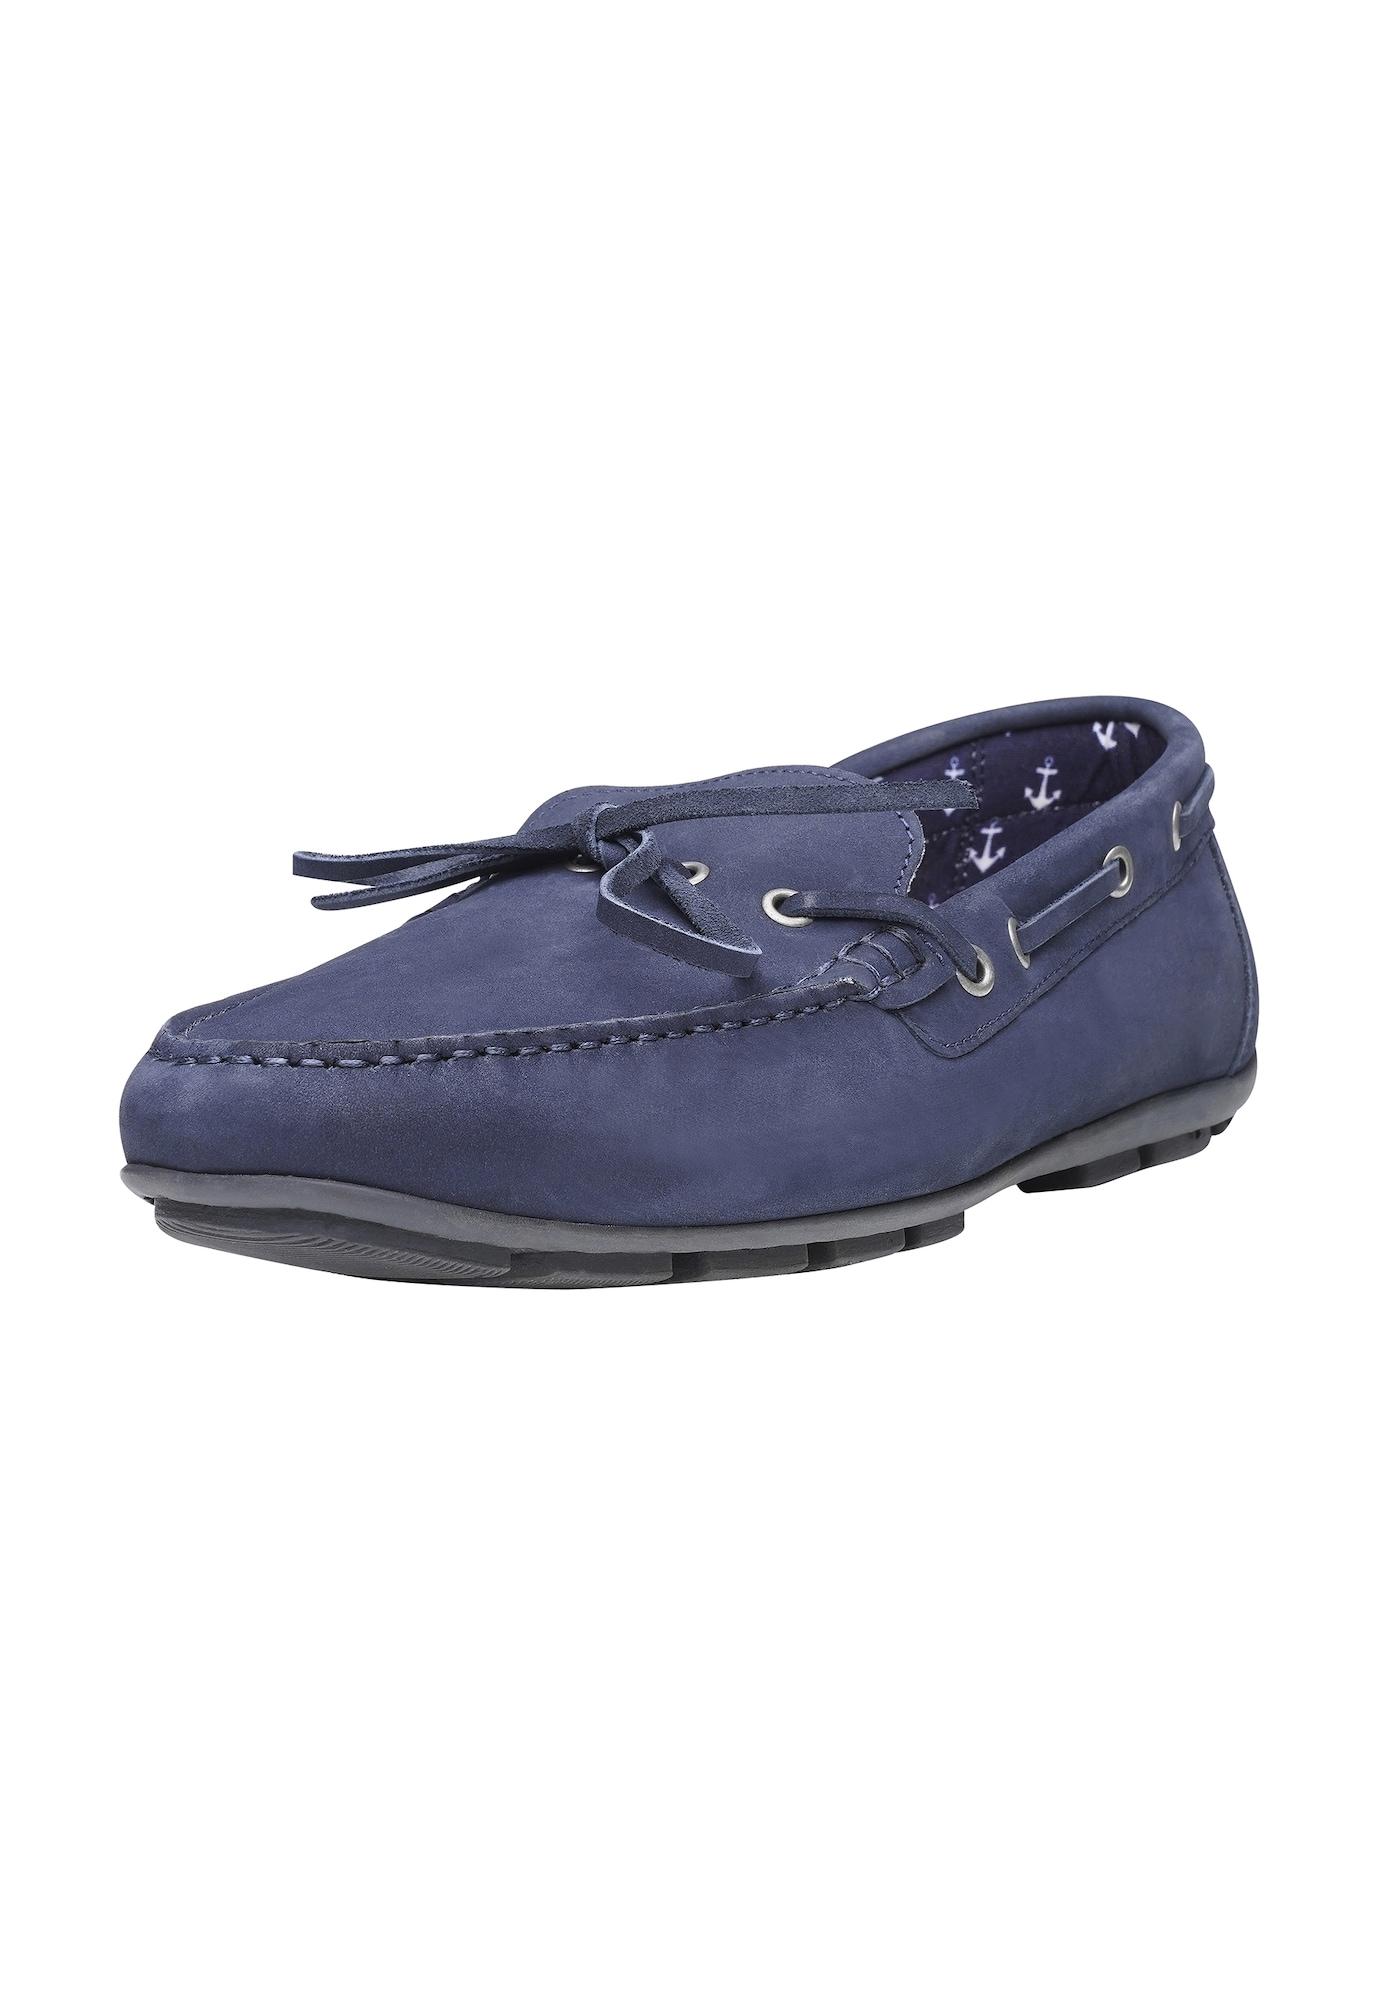 Mokassins 'No. 91 MM'   Schuhe > Mokassins   SHOEPASSION